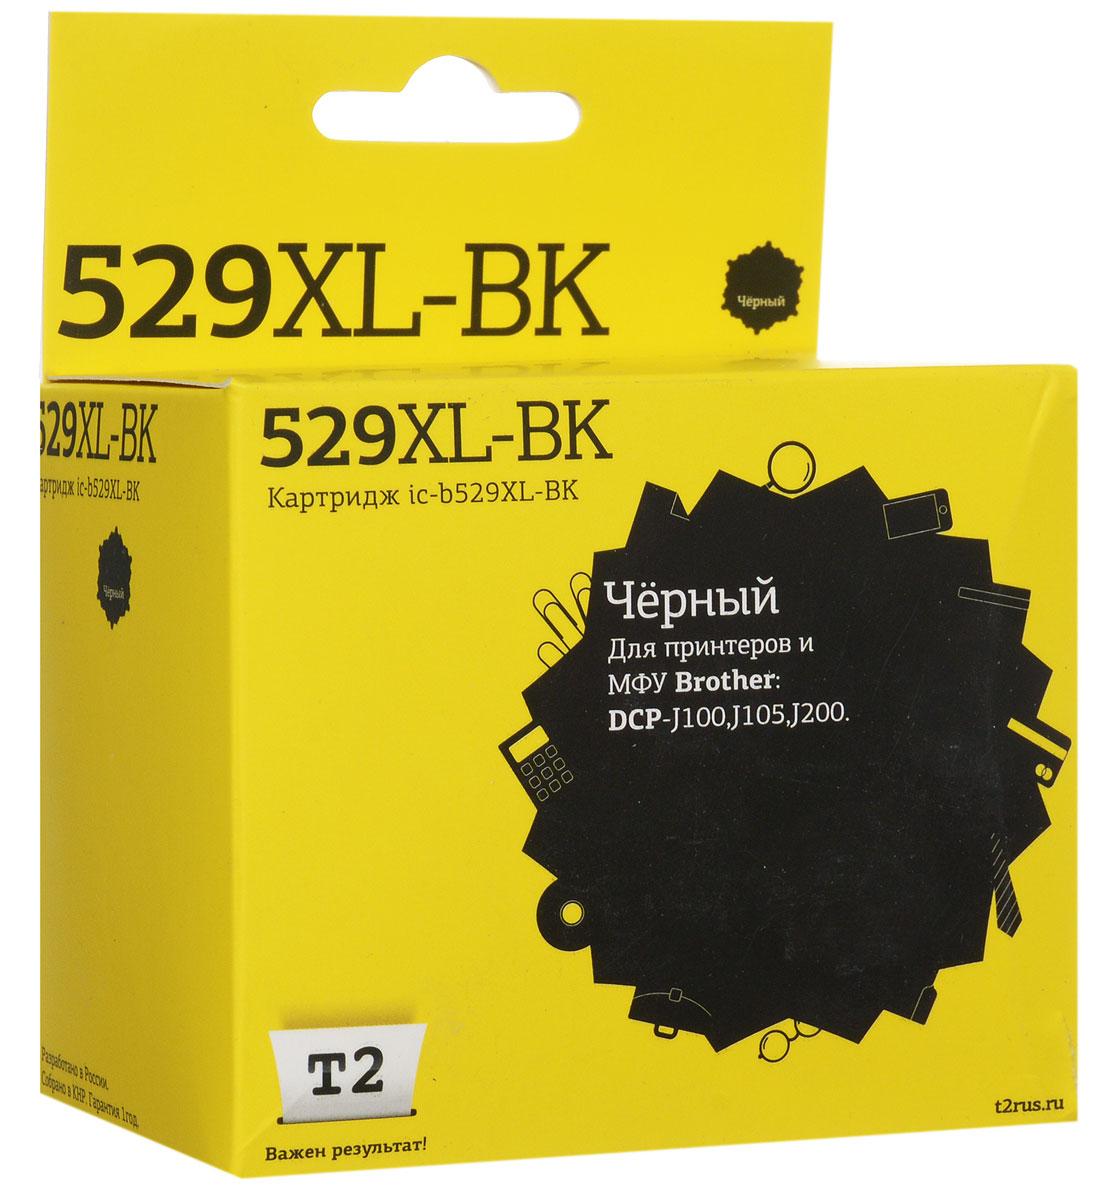 T2 IC-B529XL-BK картридж (аналог LC-529XL-BK) для Brother DCP-J100/J105/J200, Black